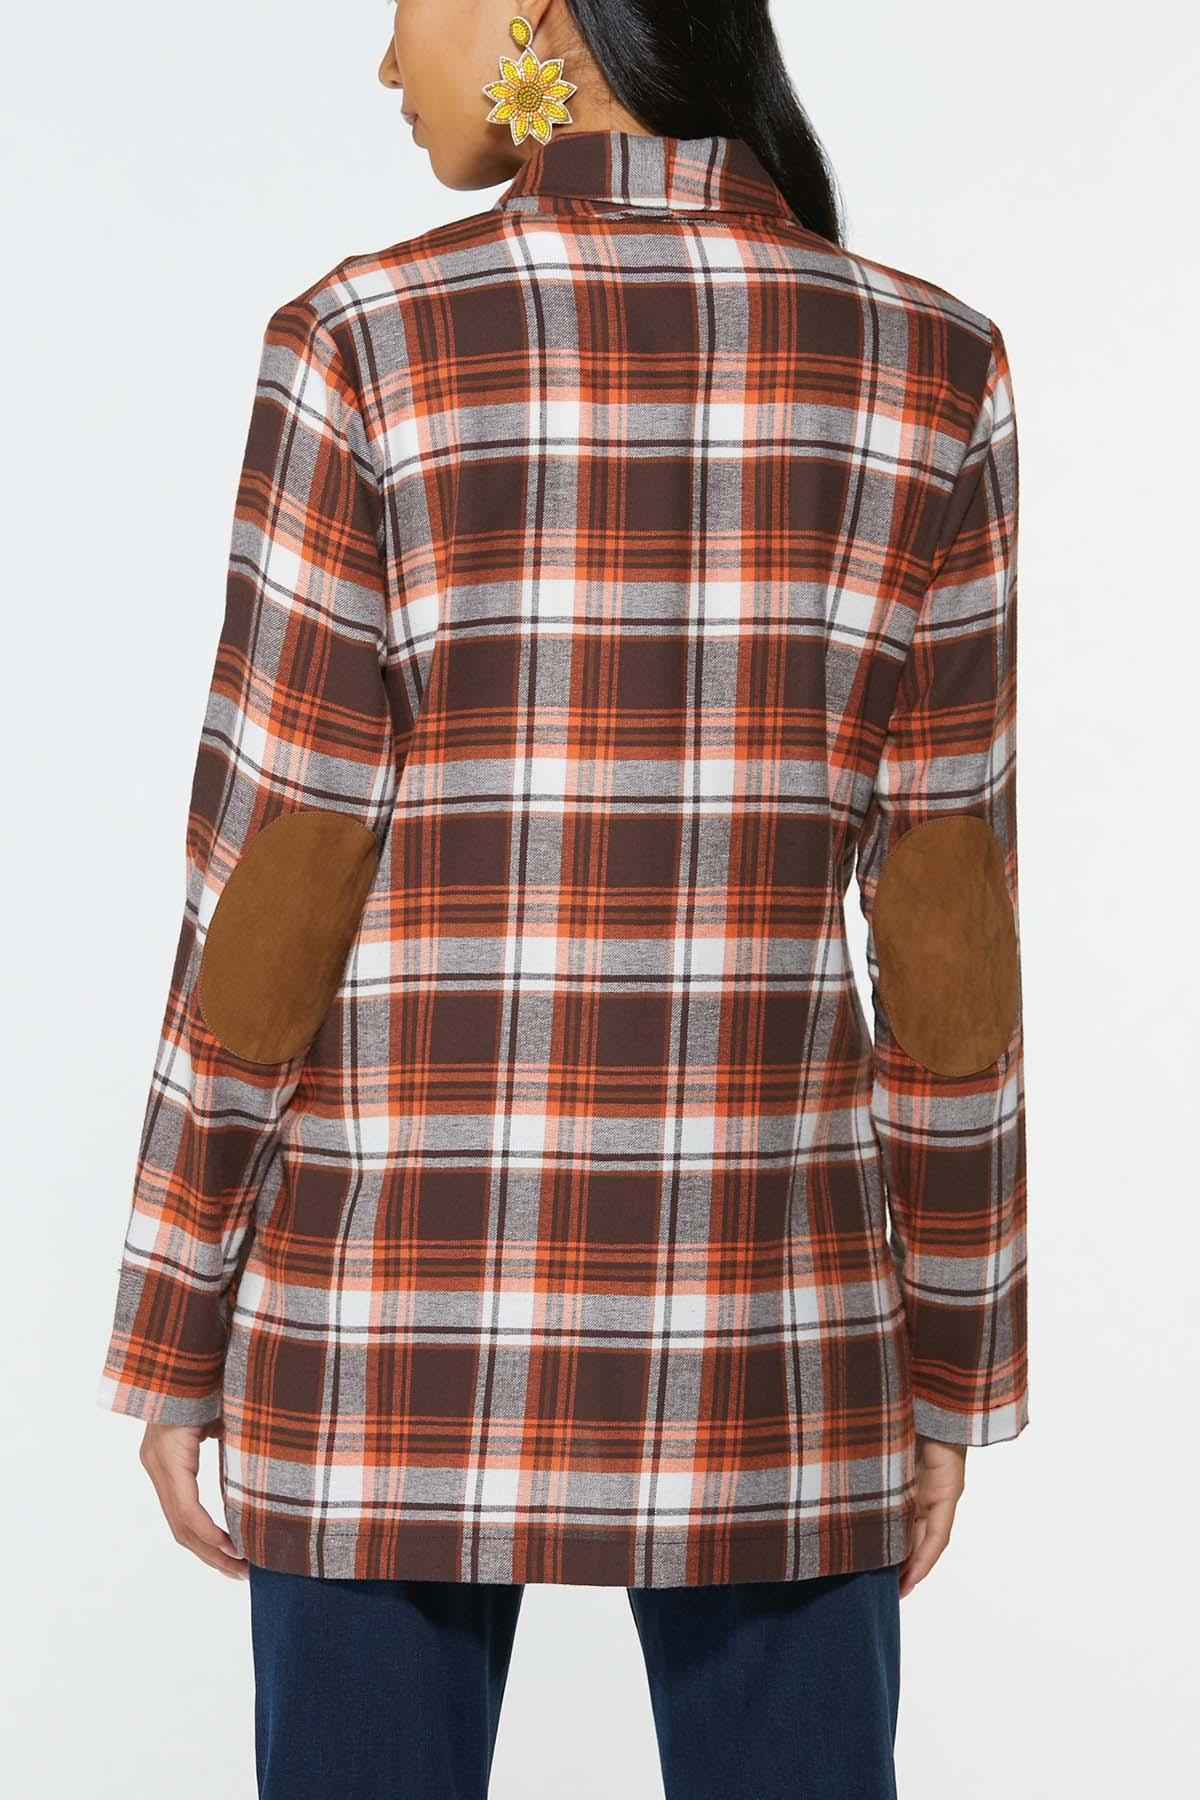 Fireside Plaid Shirt Jacket (Item #44662057)